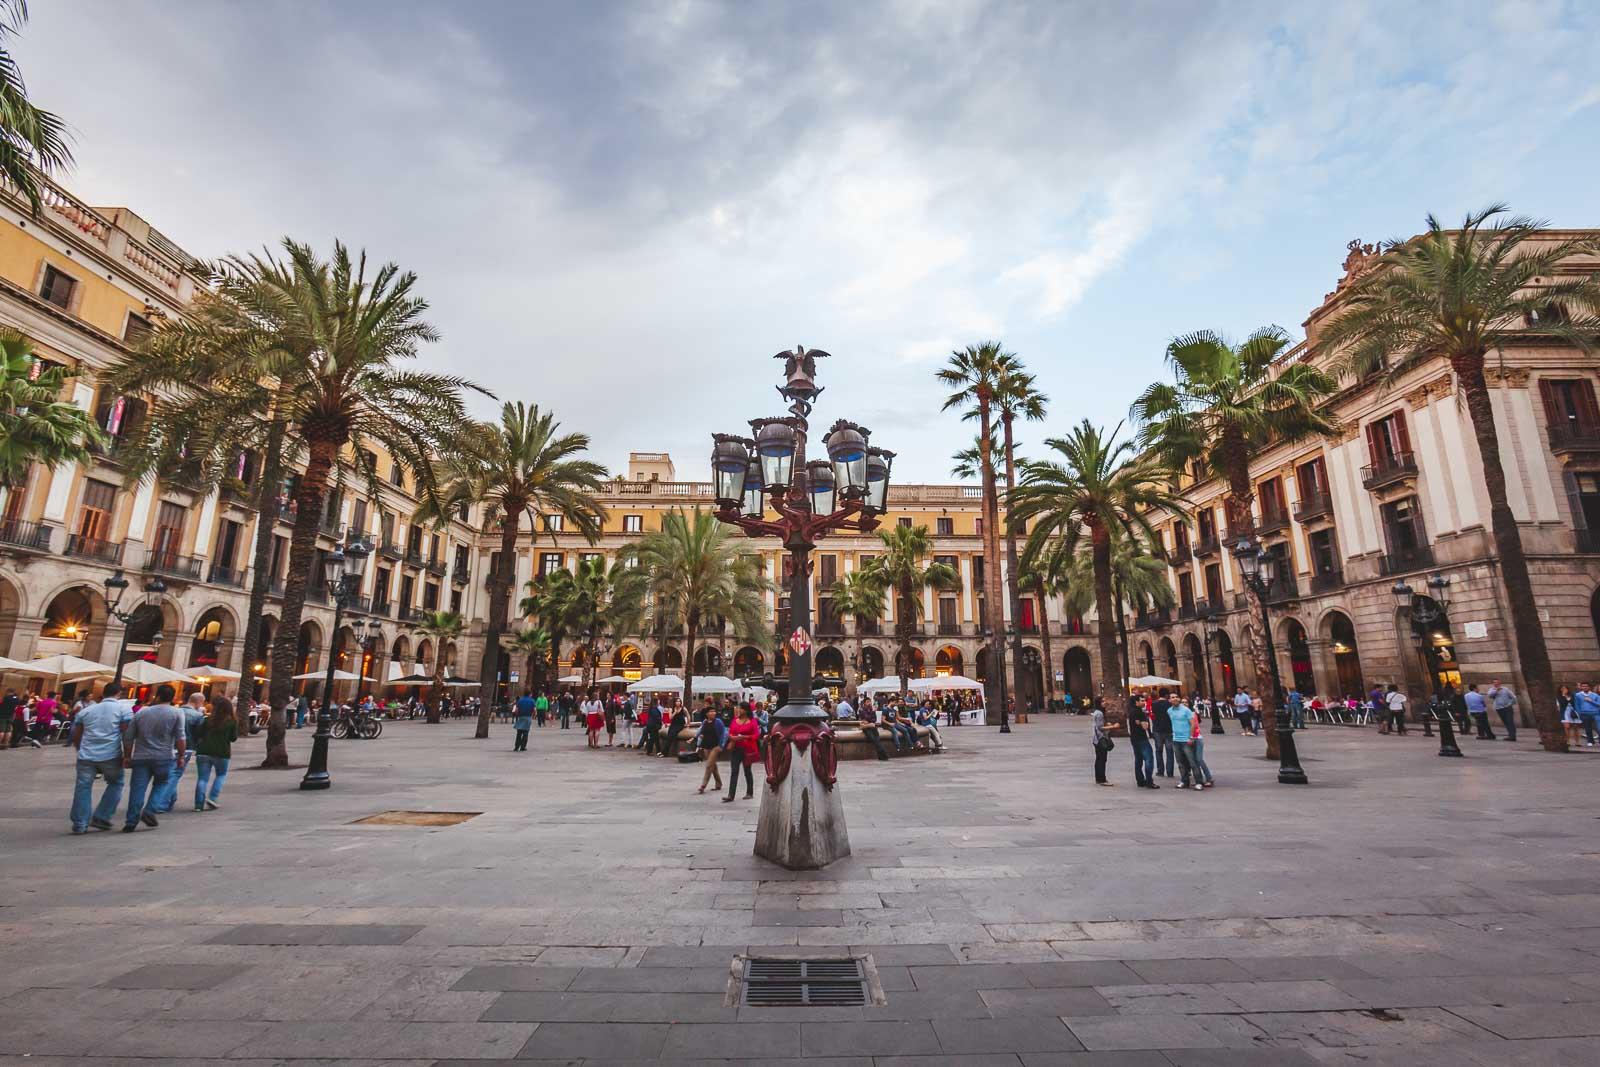 ciutat vella  in Barcelona